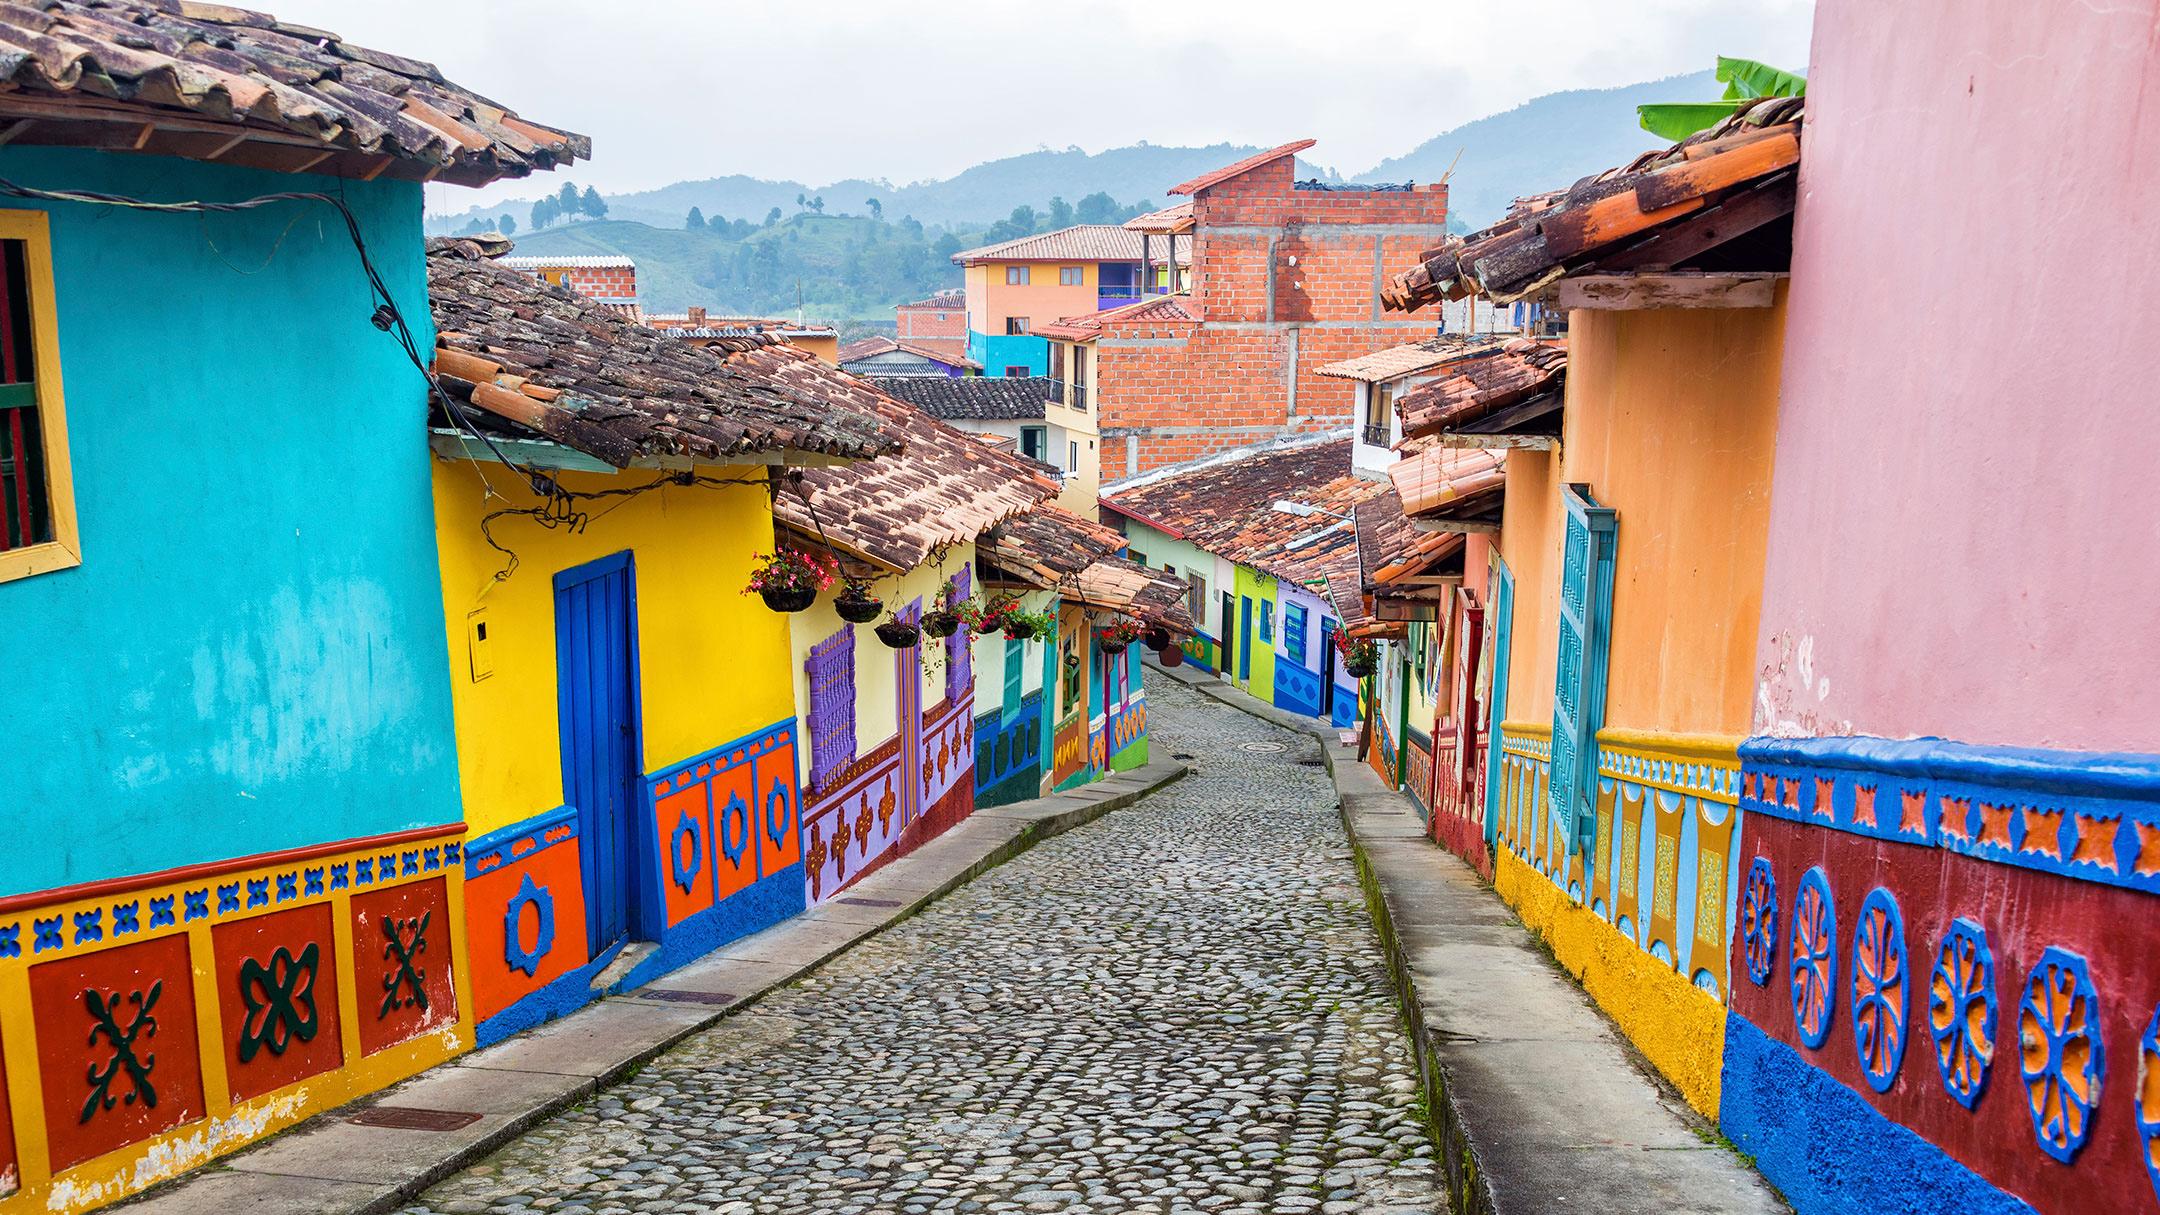 2Colombia-Medellin-Cobblestone-Street-IS-38615370-Lg-RGB.jpg